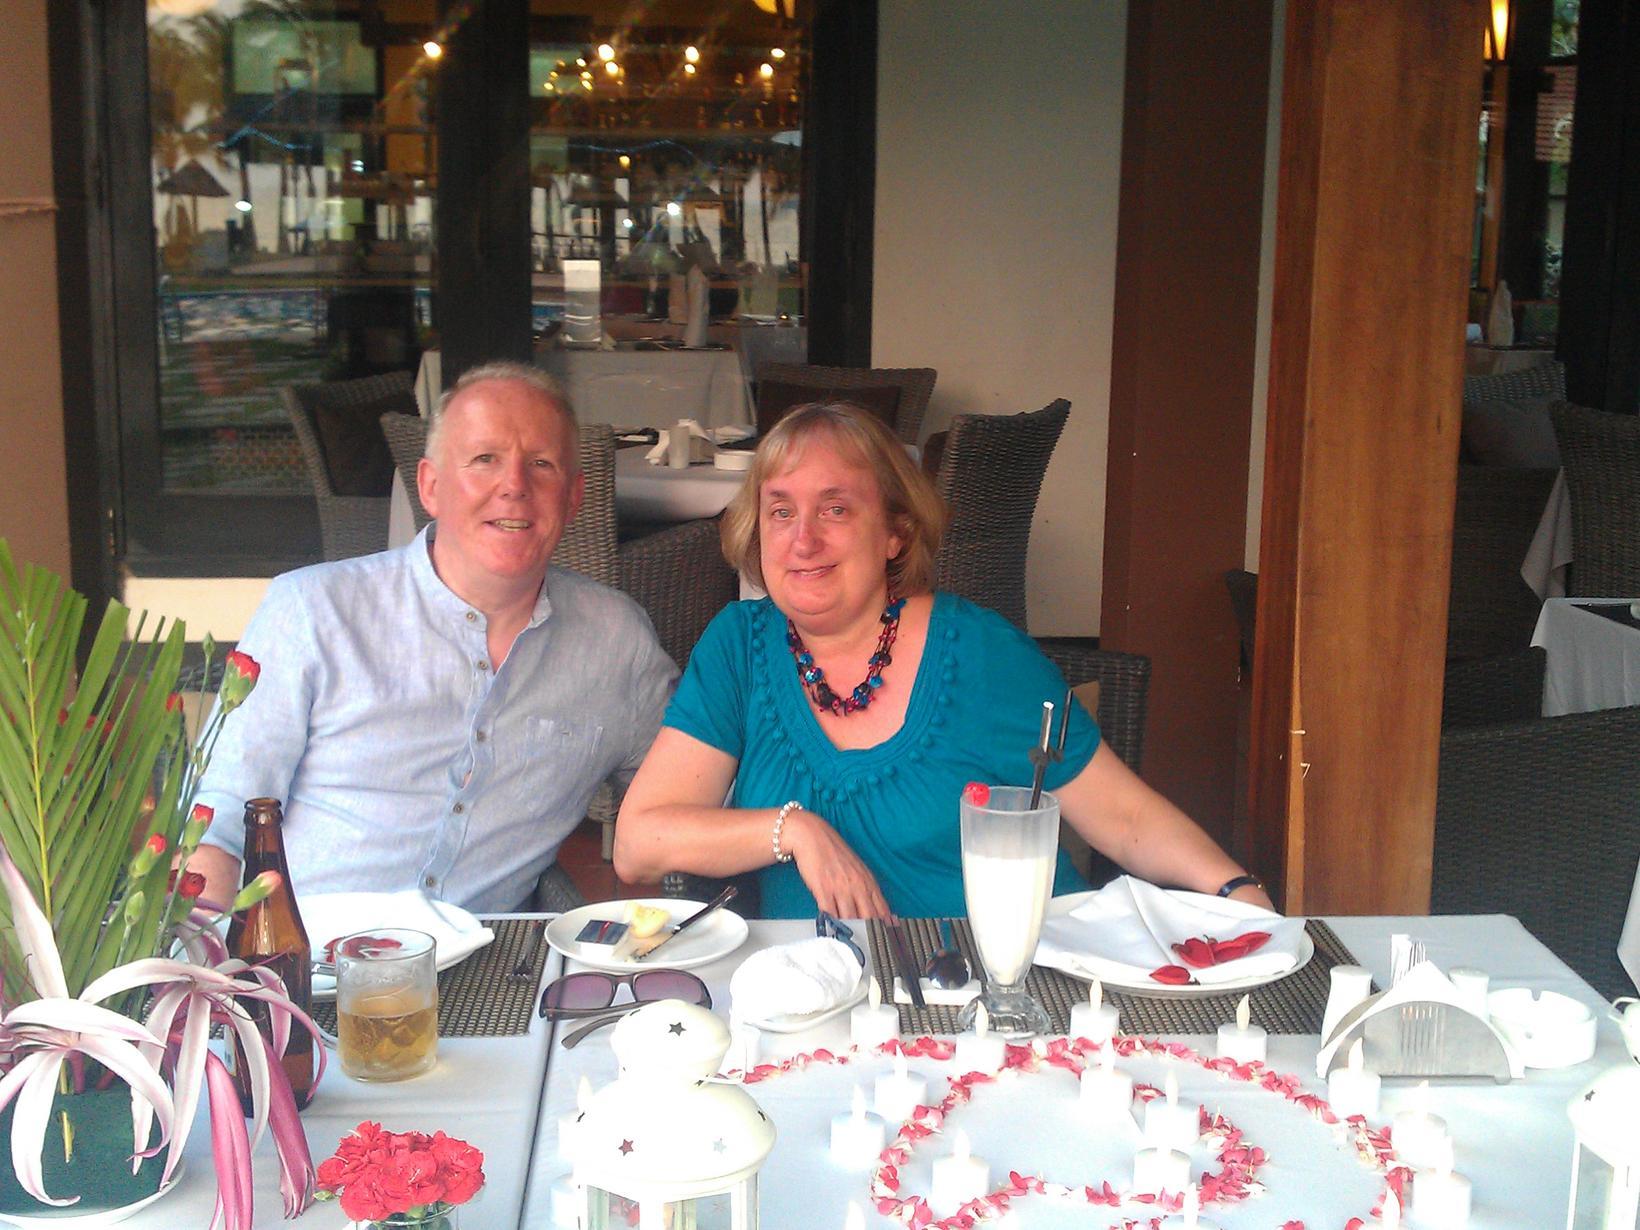 Derek & Pam from Harrogate, United Kingdom